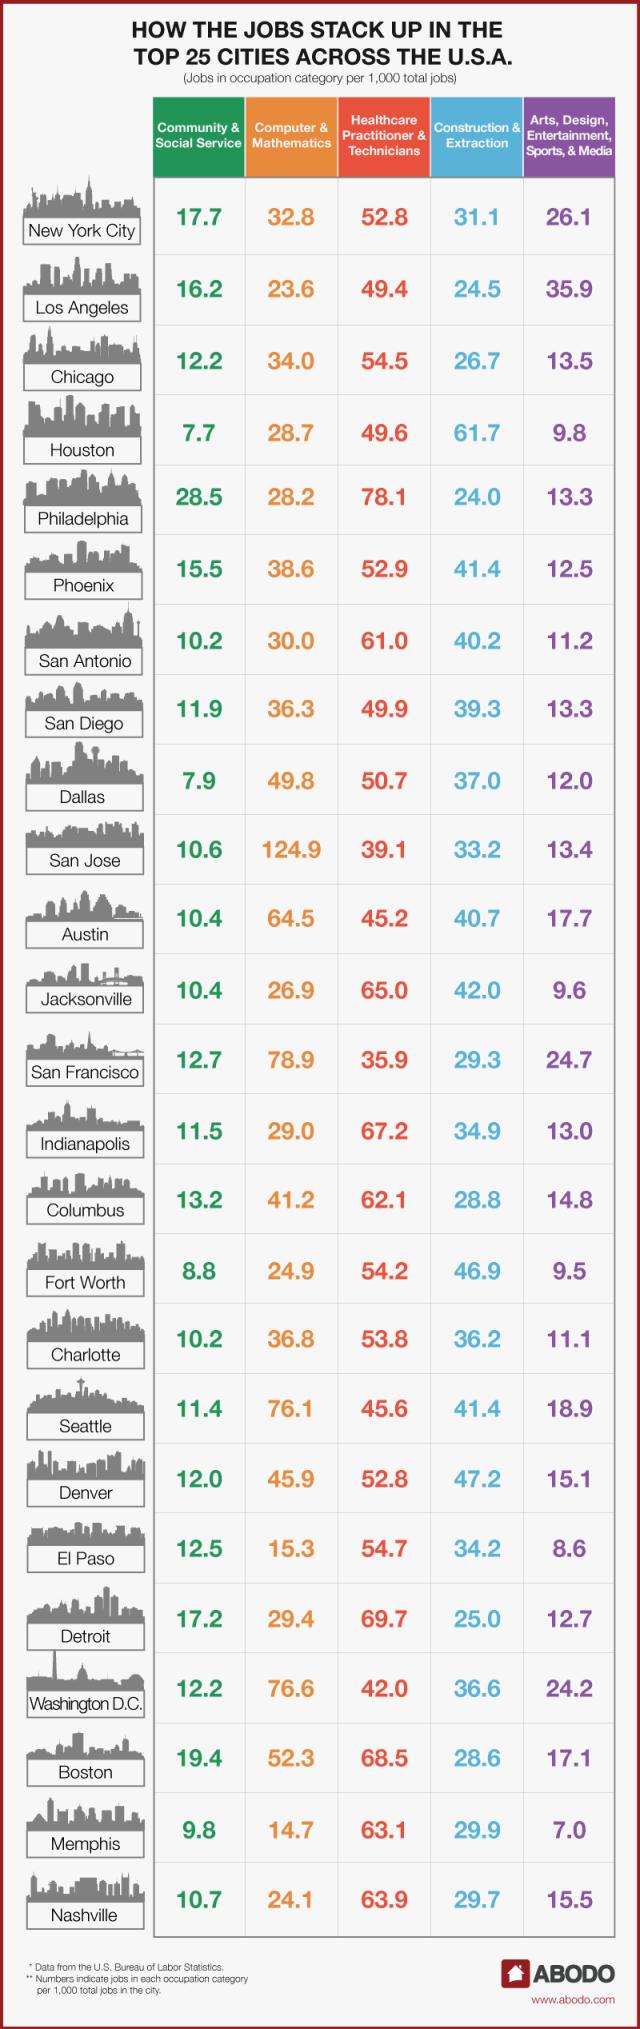 chart_top25citiesfastestgrowingoccupations1